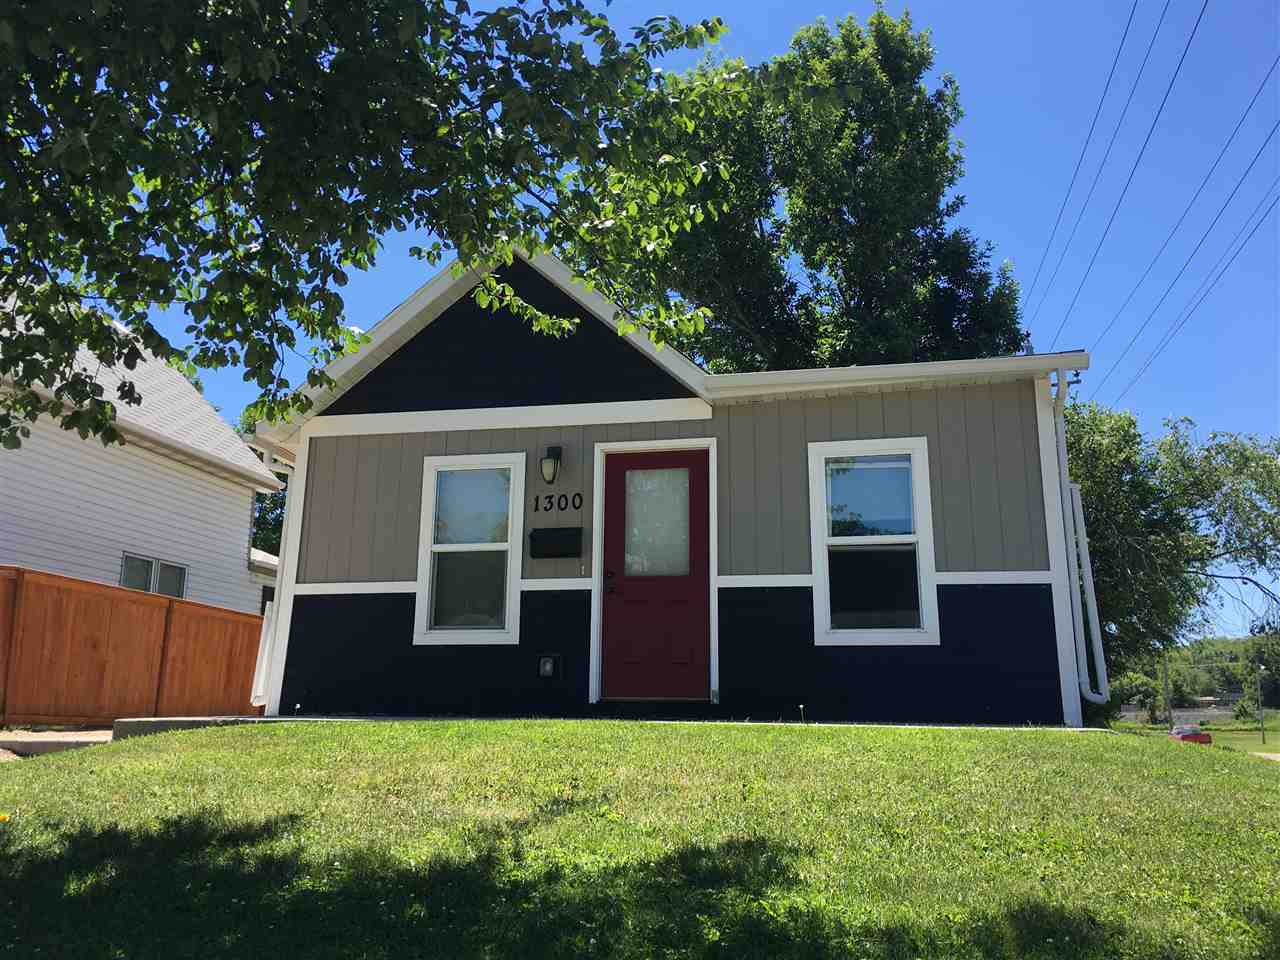 1300 SE 5th Ave, Minot, ND 58701